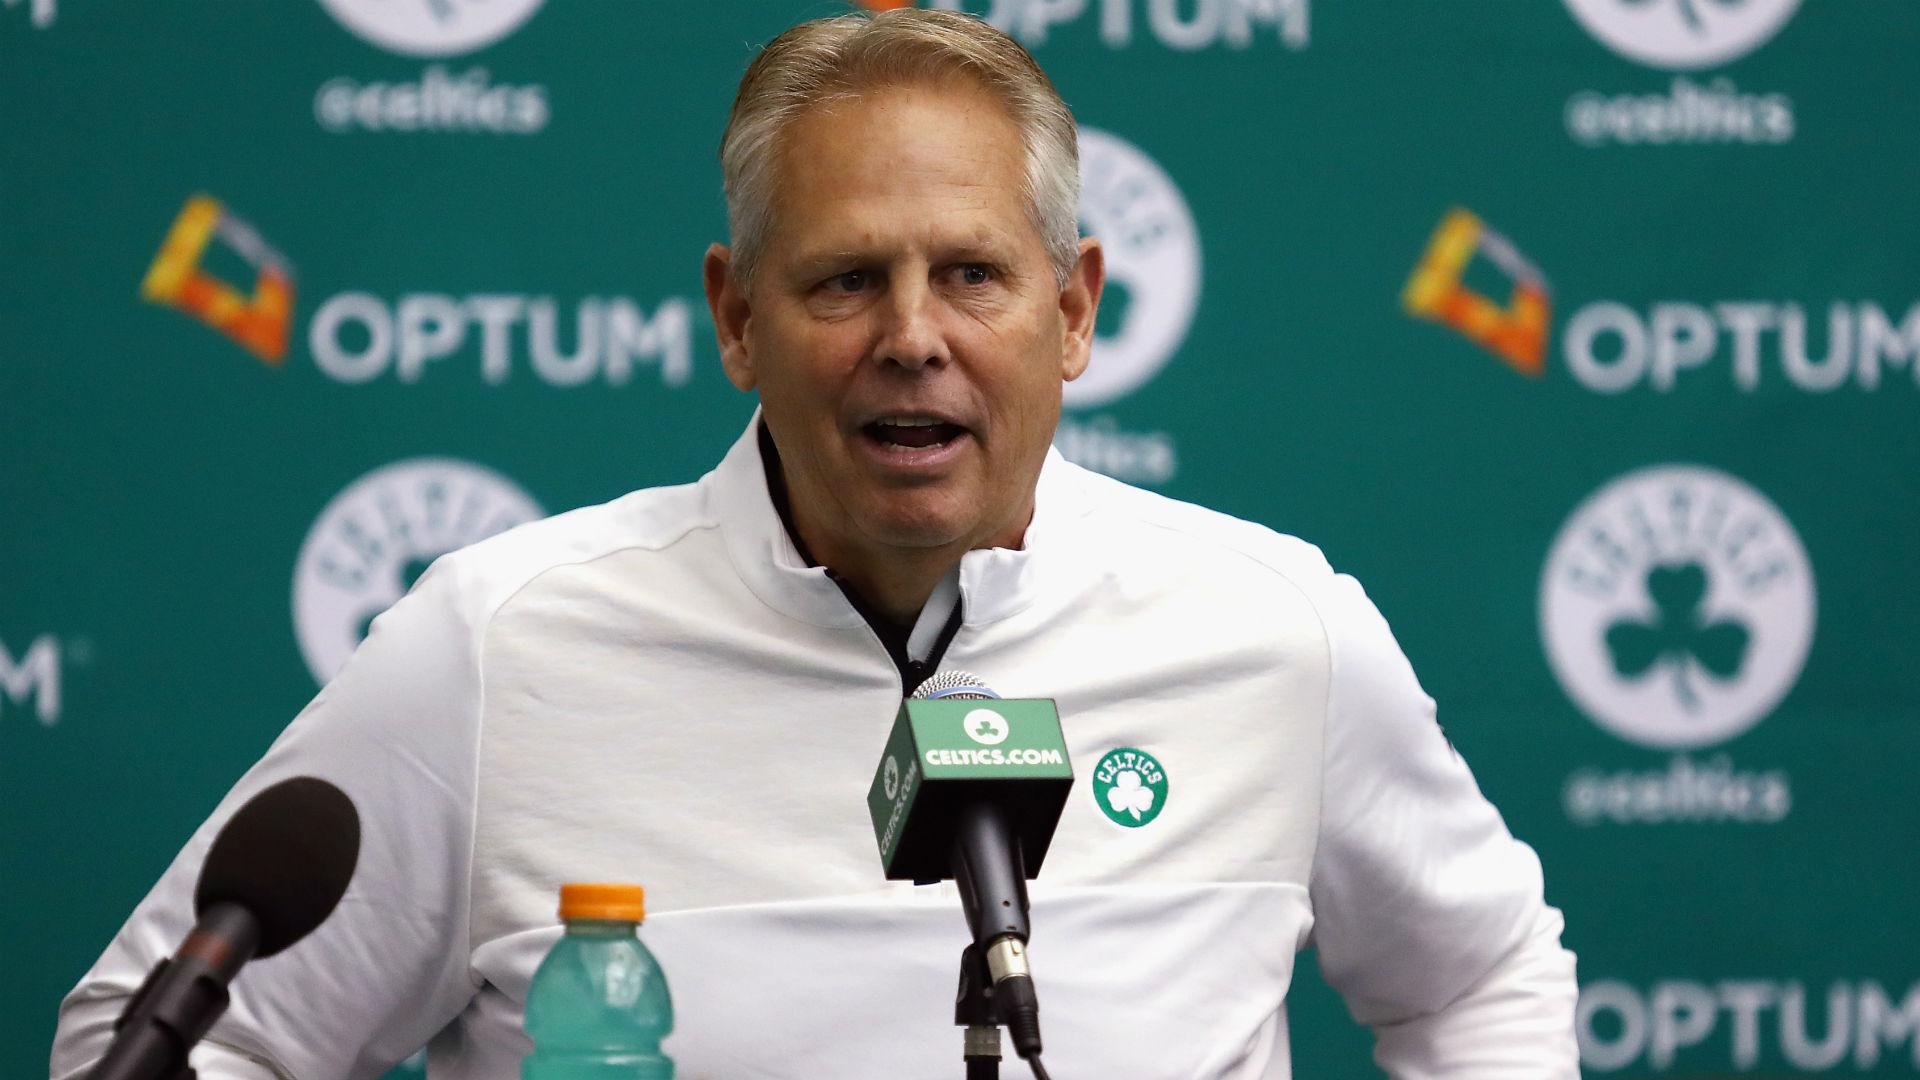 Celtics' Danny Ainge on roster changes: 'Are we good enough?'